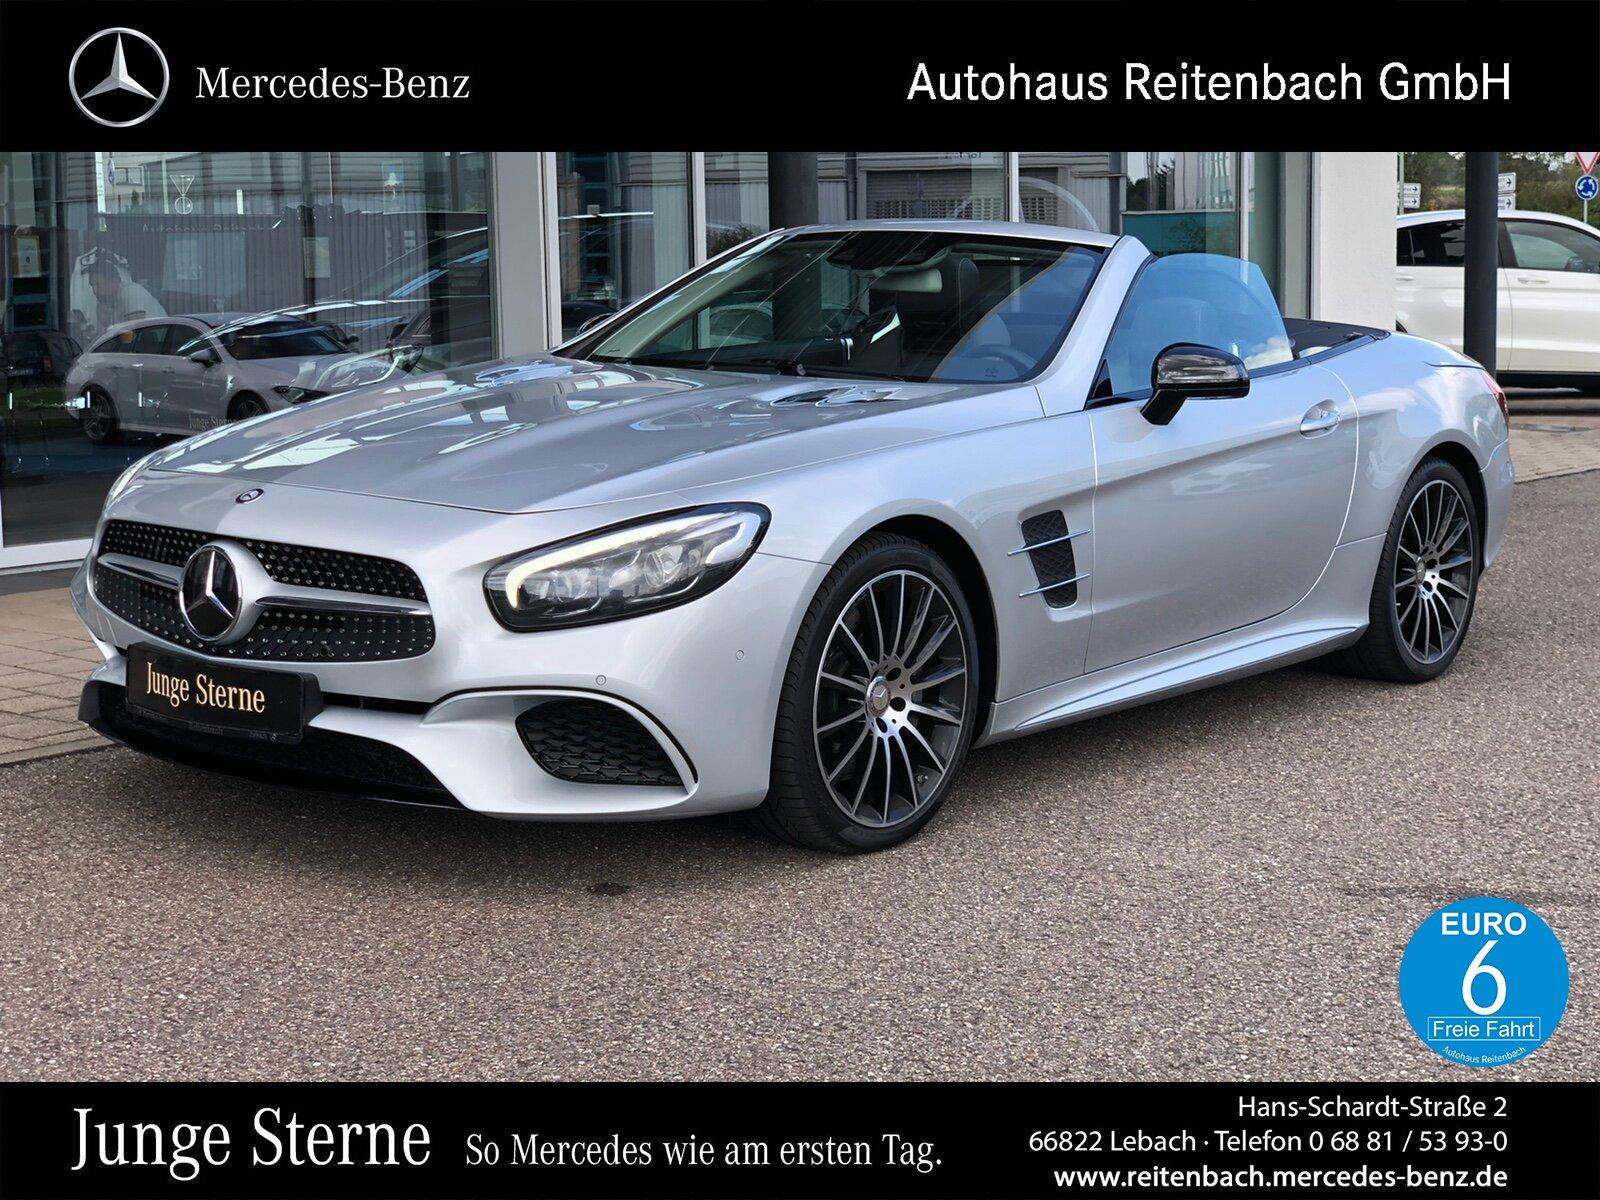 Mercedes-Benz SL 500 AMG Line/COMAND APS/Pano.-Dach/Distronic, Jahr 2016, Benzin